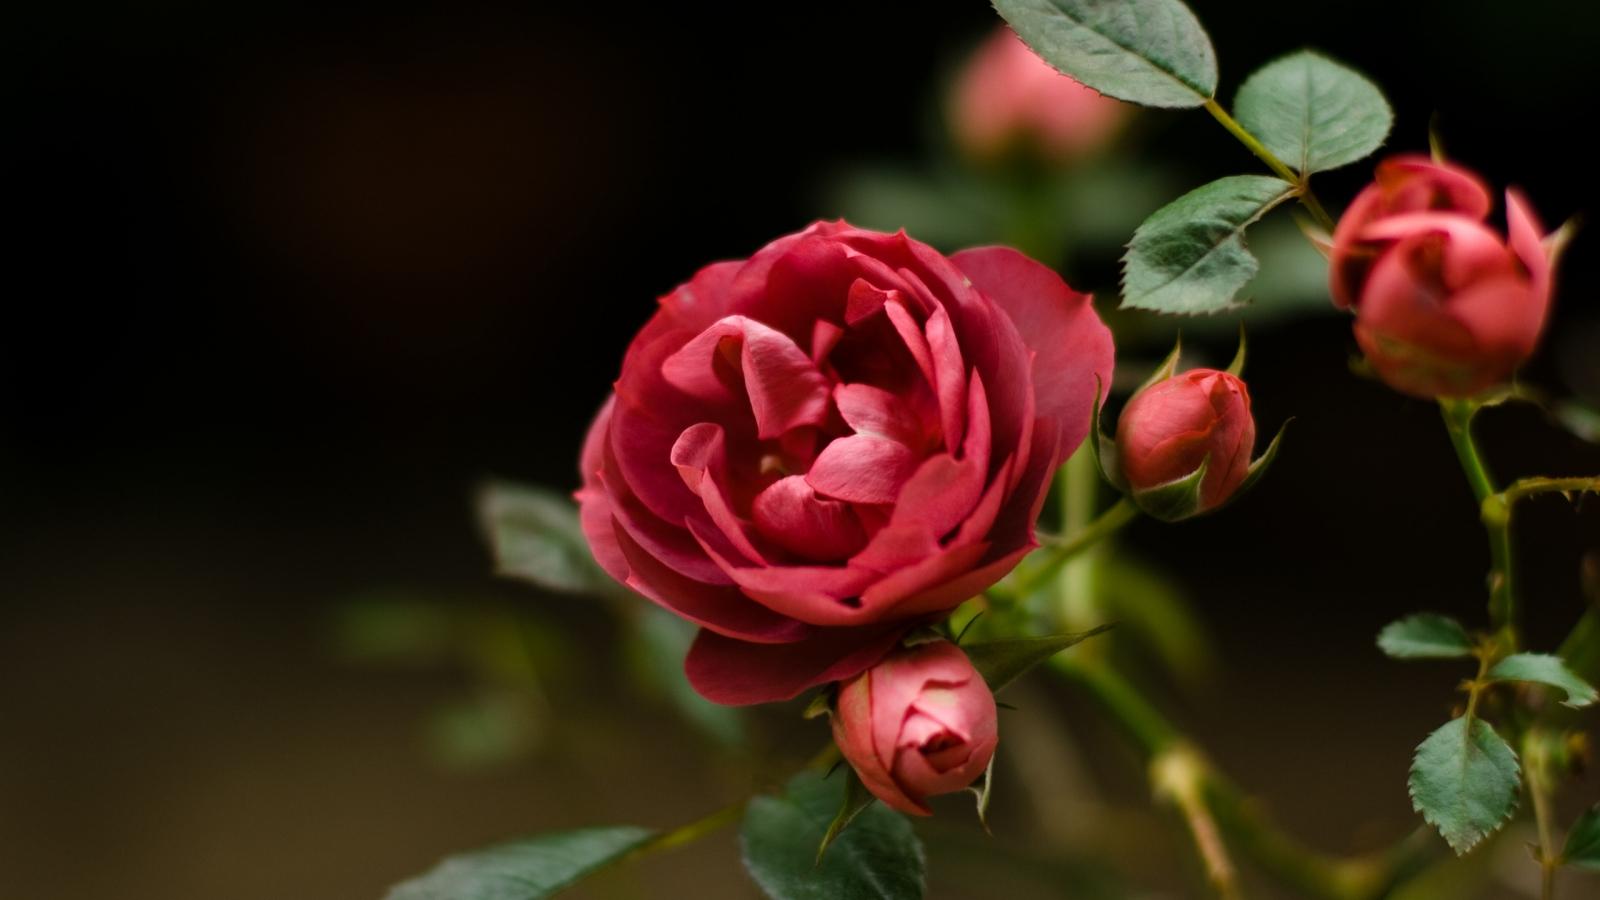 Hd wallpaper rose - Hd Wallpaper Rose Flower Beautiful Rose Flowers Hd Wallpaper 1600x900 Pixel Popular Hd